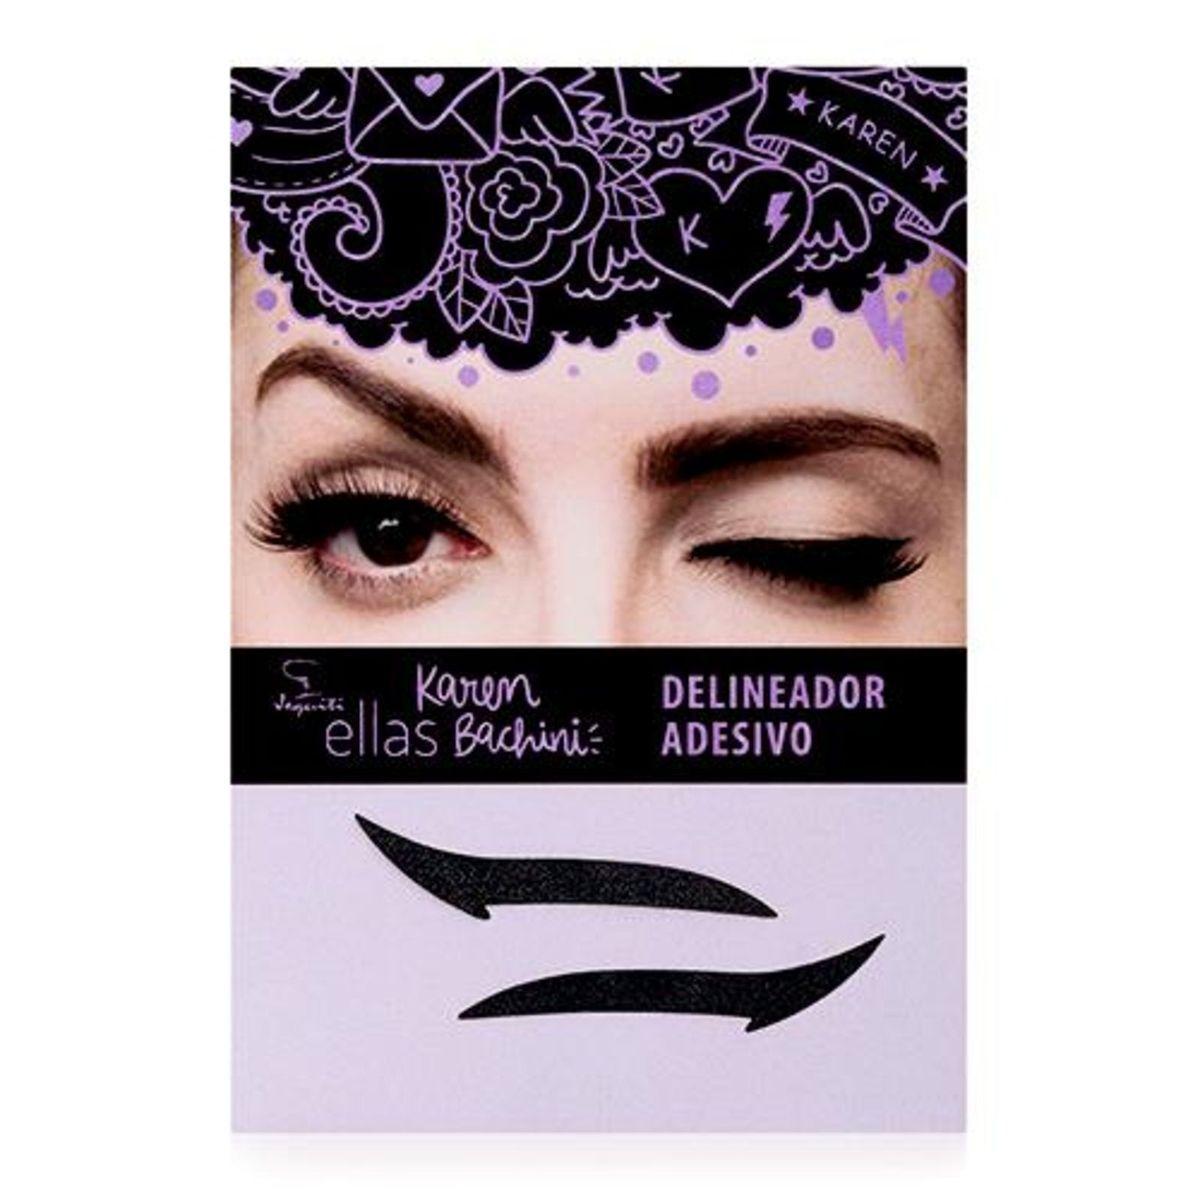 Delineador Adesivo Gatinho   Maquiagem Feminina Jequiti Nunca Usado  20   enjoei